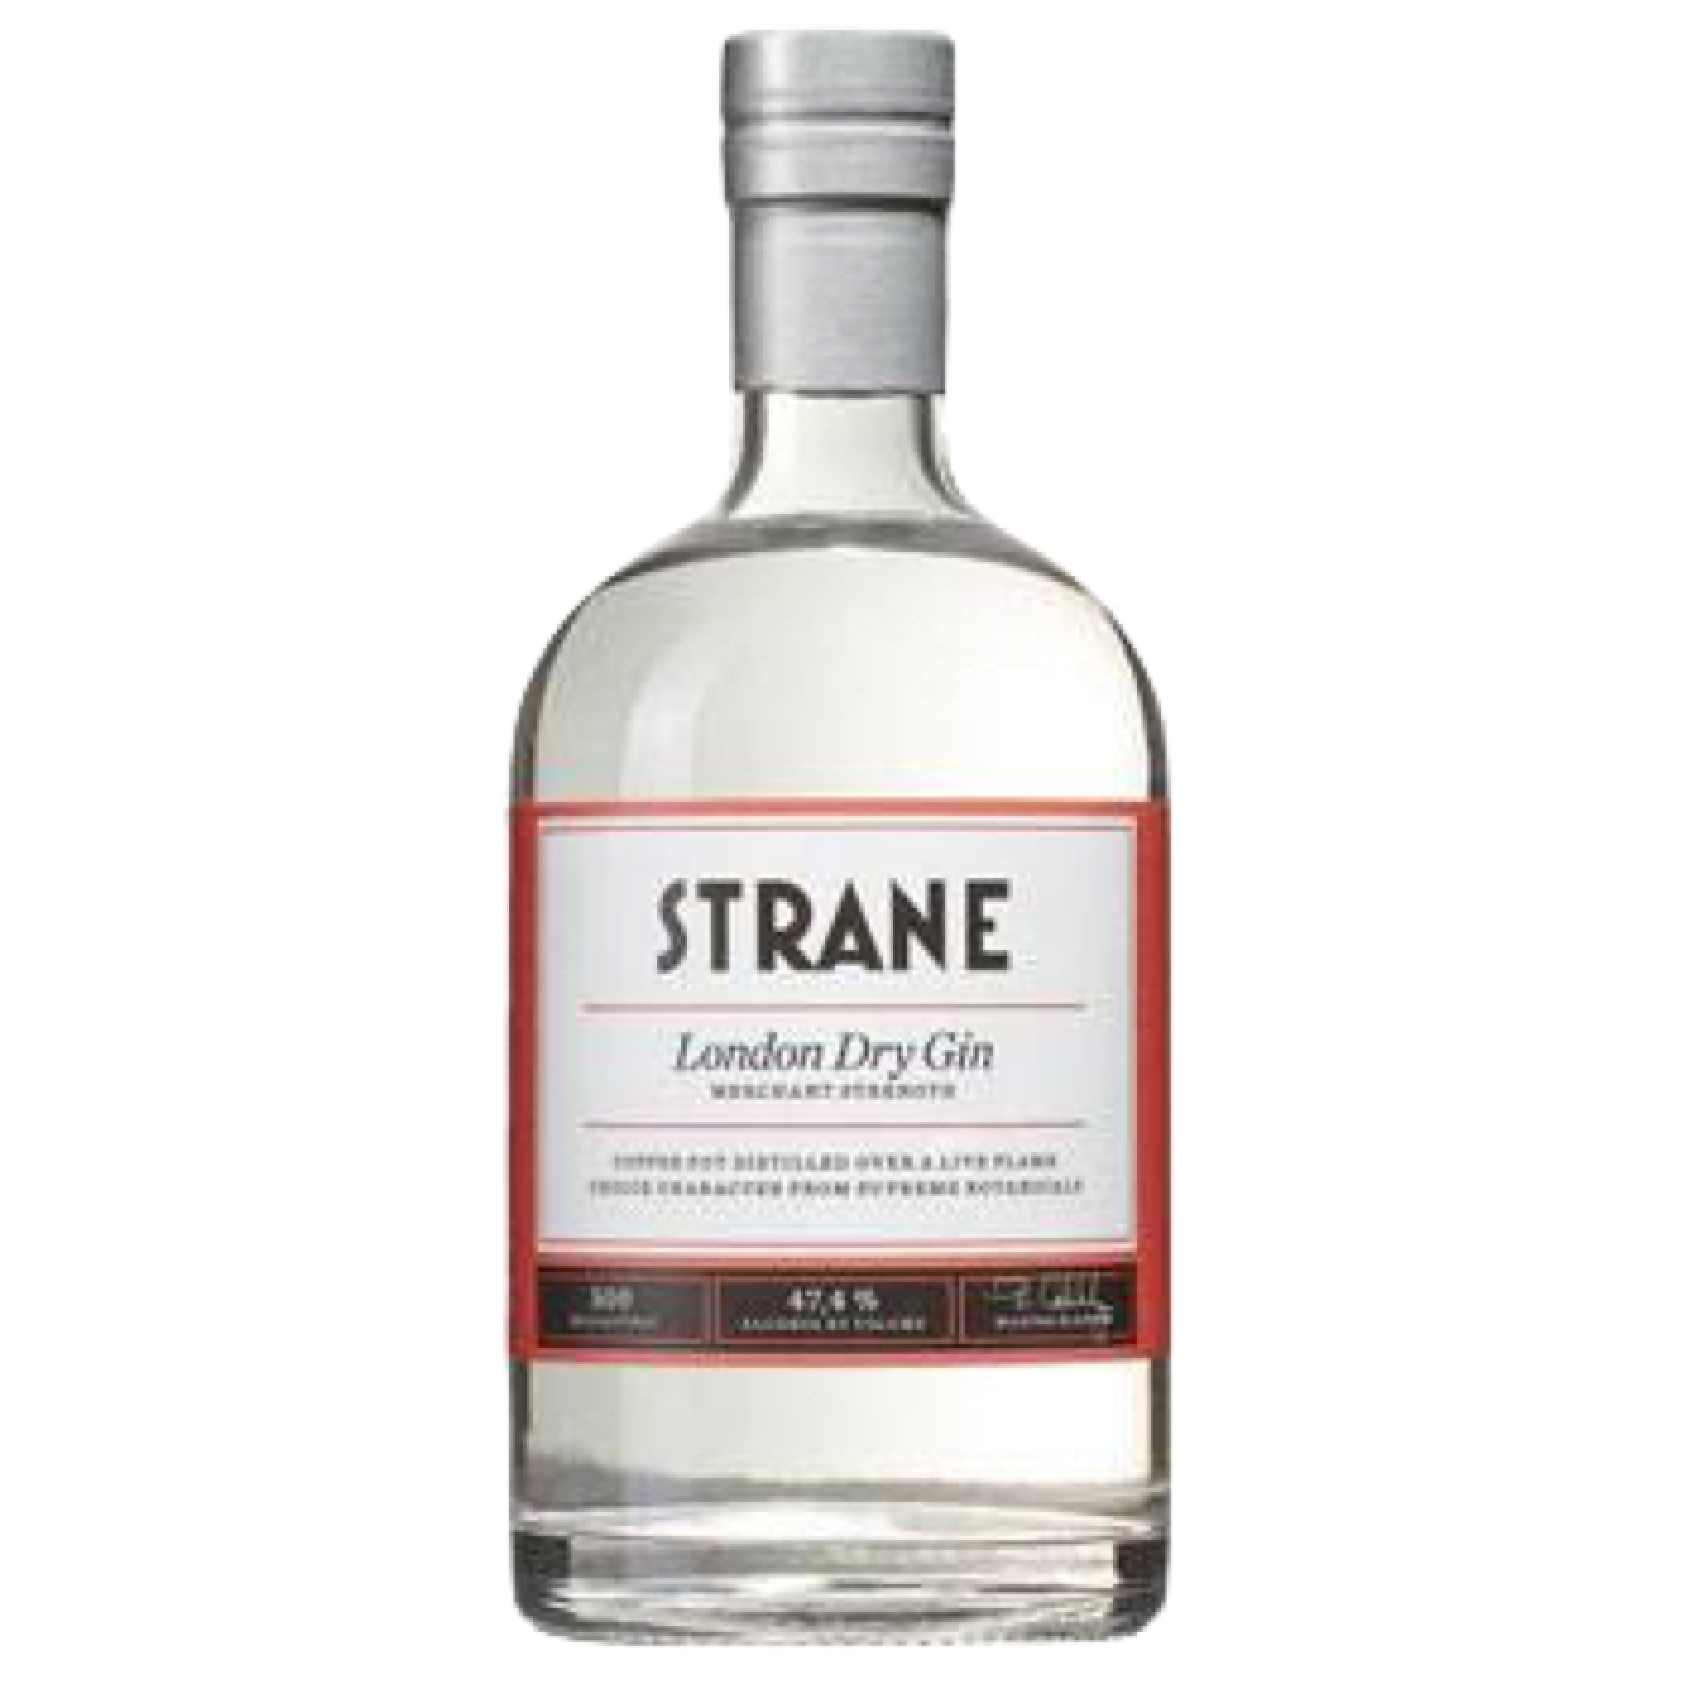 Strane London Dry Gin Merchant Strength